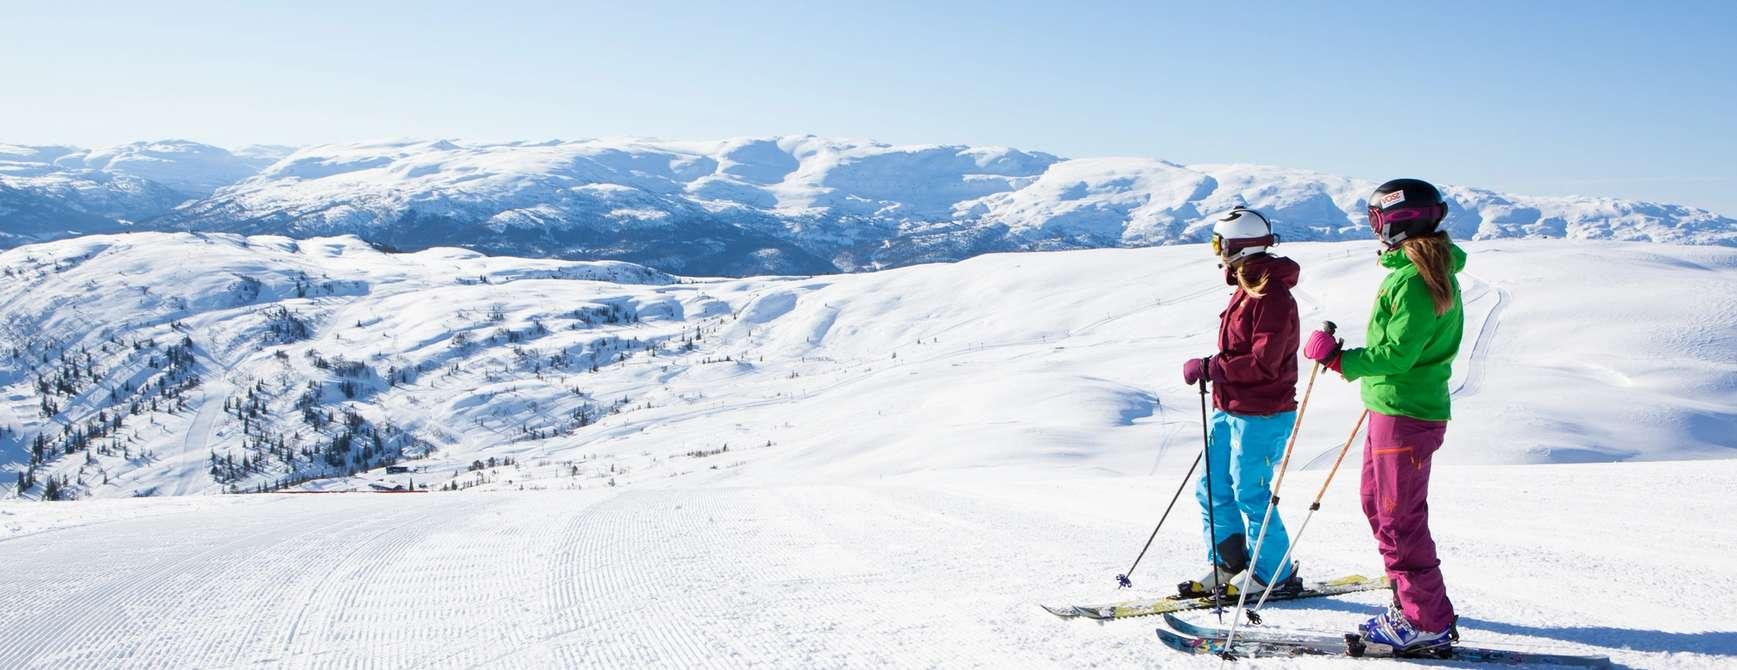 Foto: Voss Resort / Per Finne